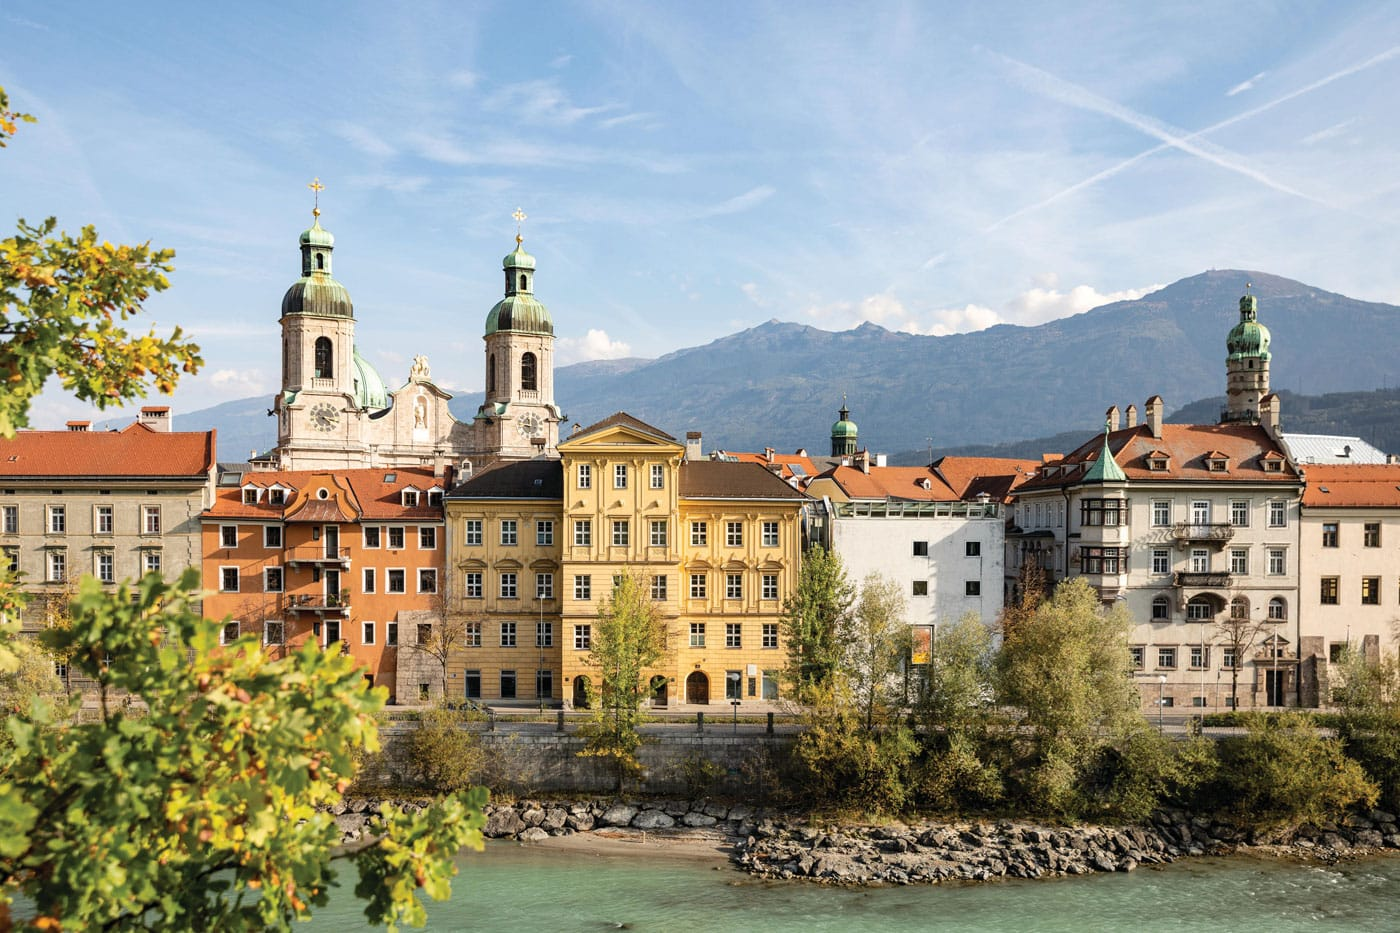 Familienurlaub in Innsbruck // HIMBEER